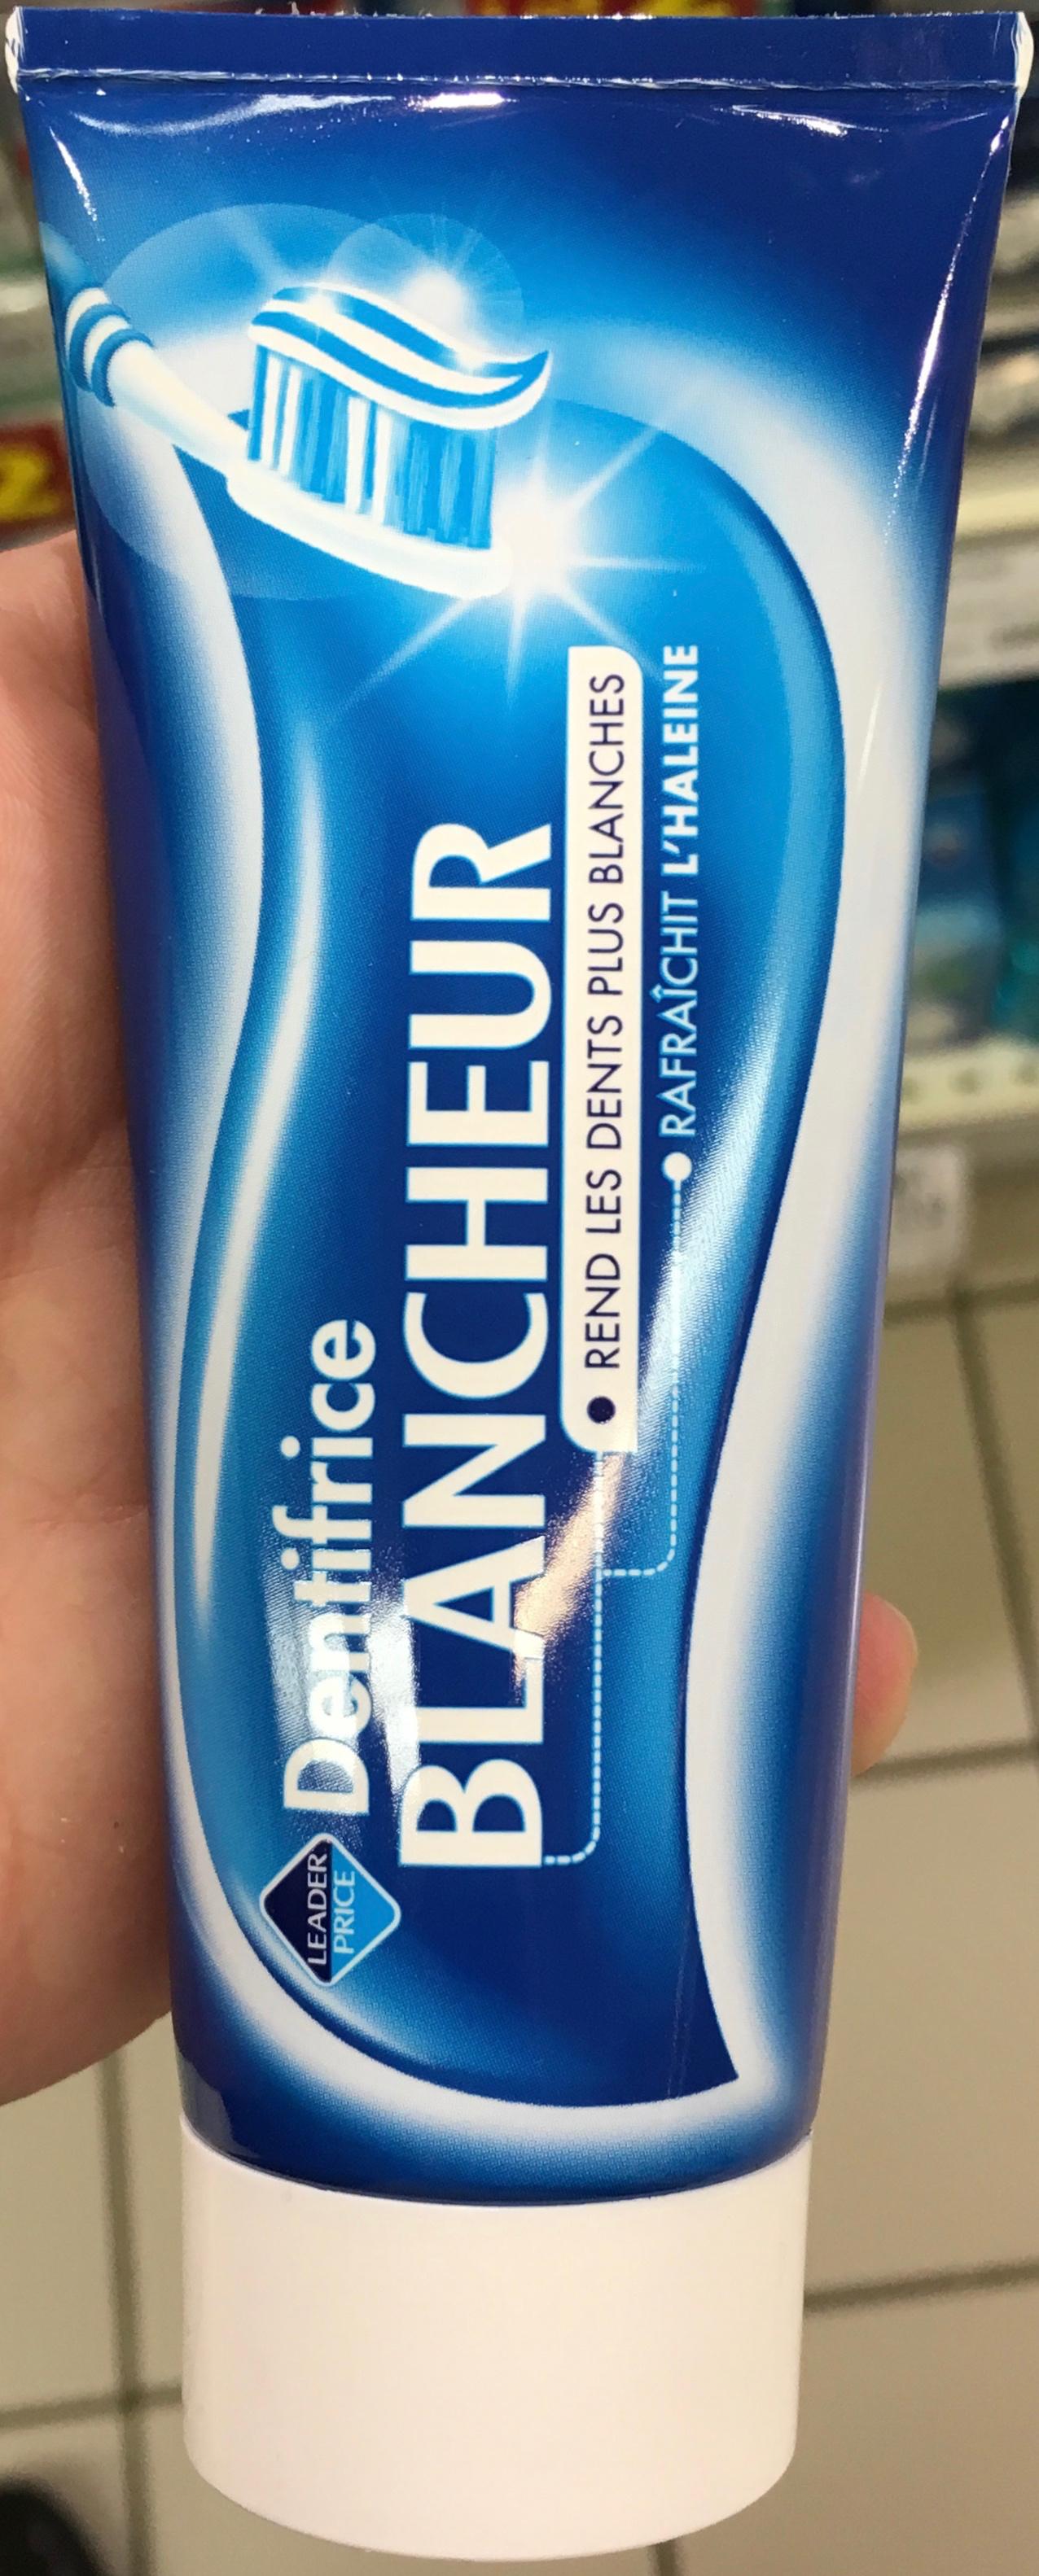 Dentifrice blancheur - Produit